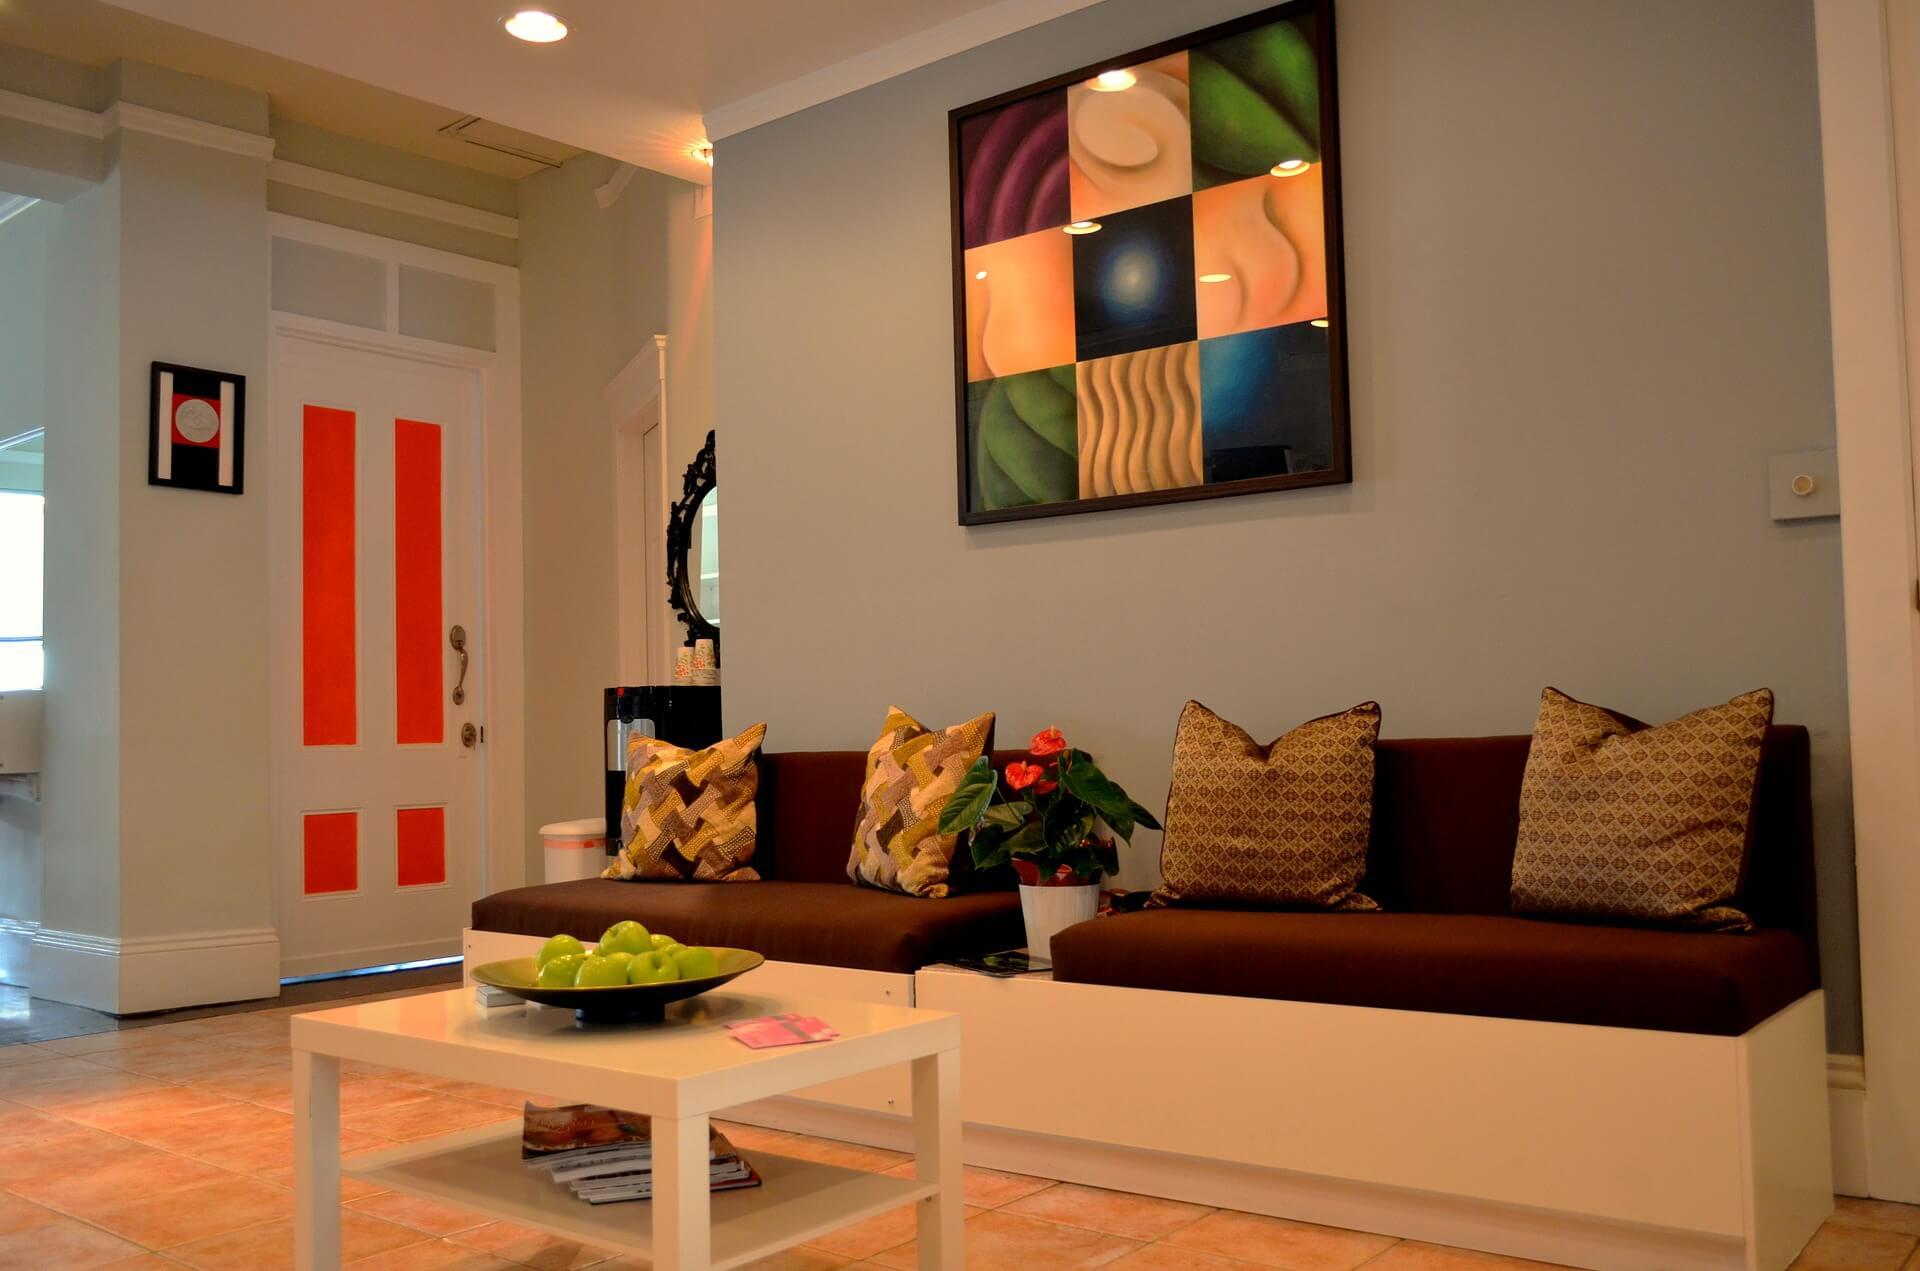 3 Tips for Matching Interior Design Elements Together